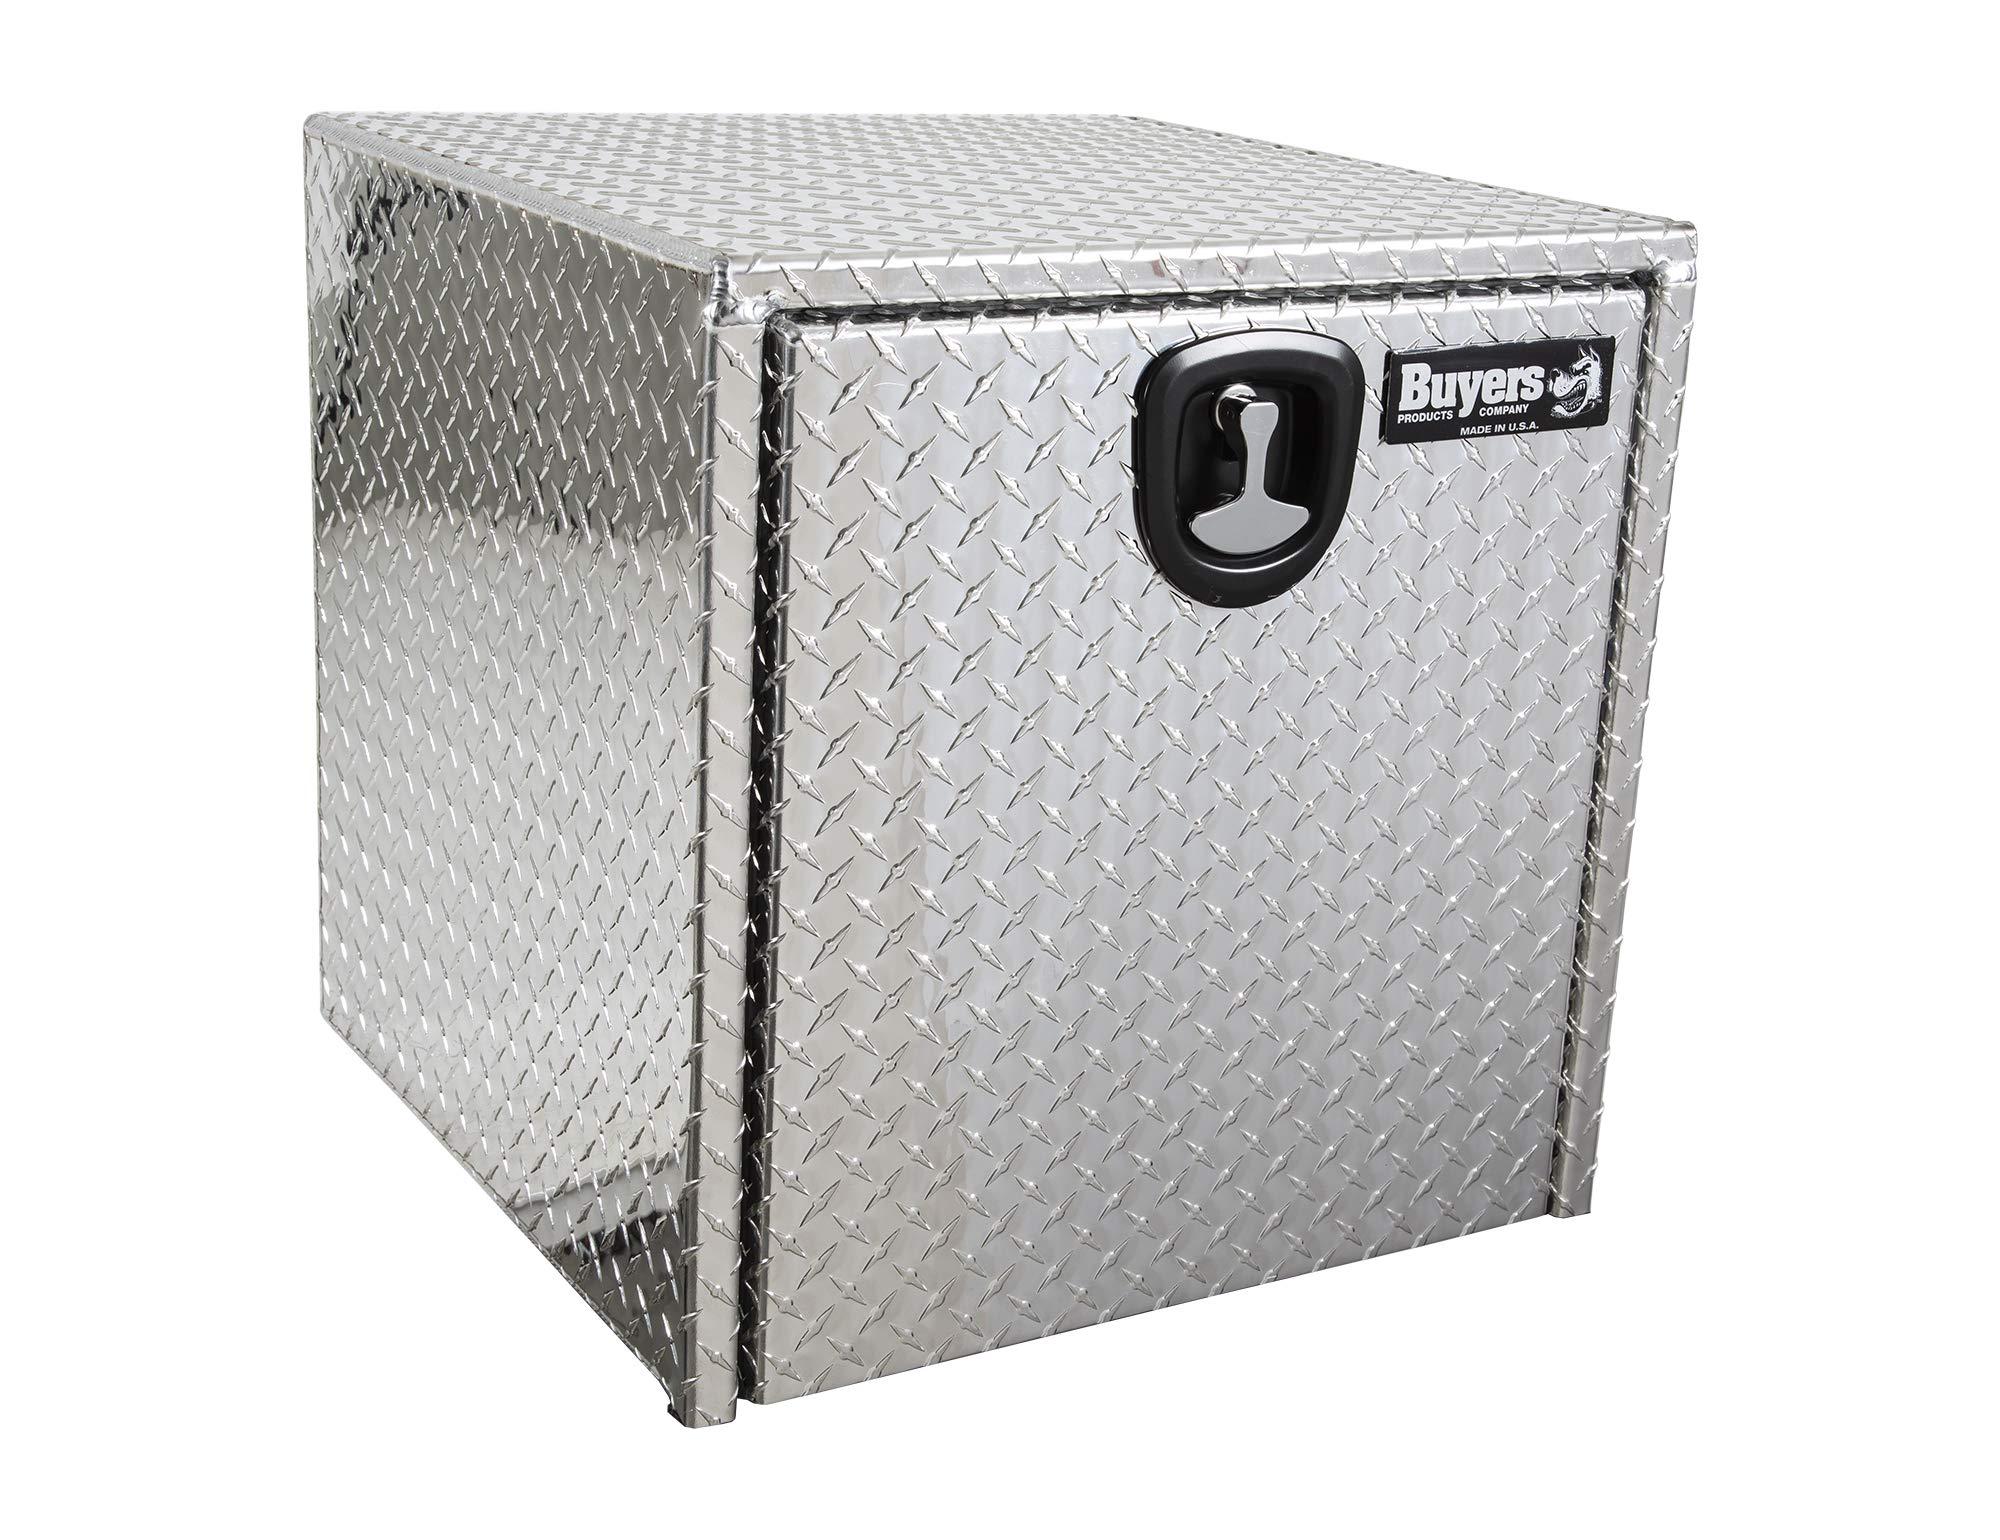 Buyers Products Diamond Tread Aluminum Underbody Truck Box w/ 3-Point Latch (24x24x24 Inch)